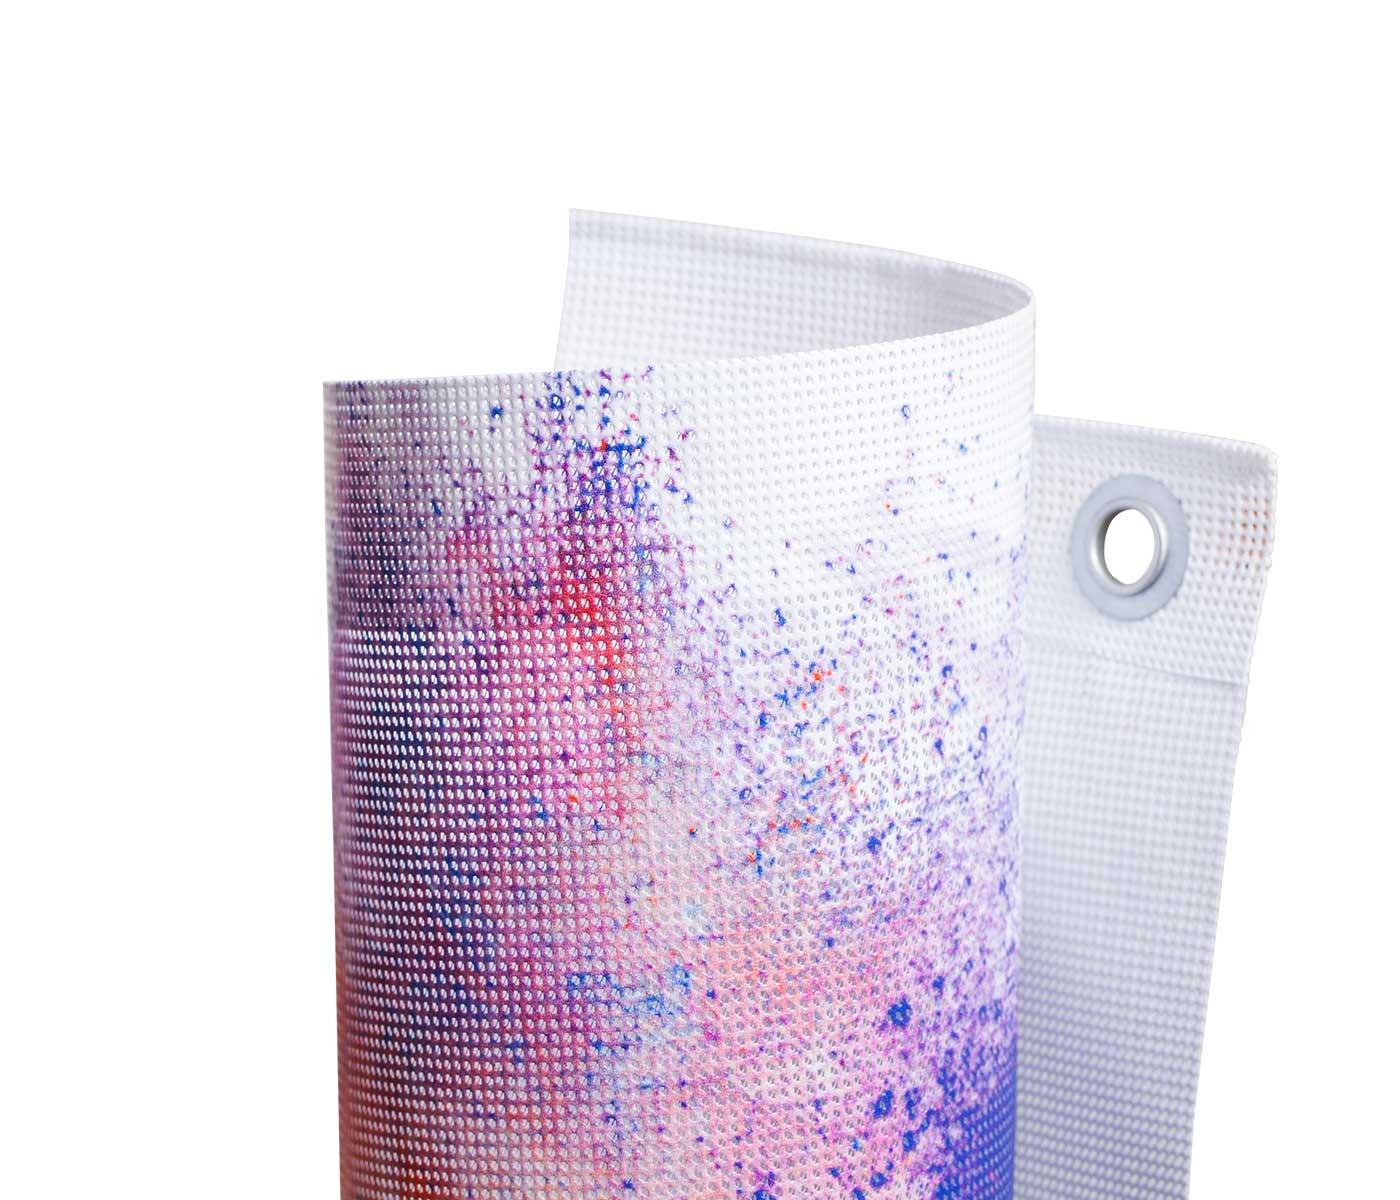 Produktbild Detailaufnahme PVC Mesh Material